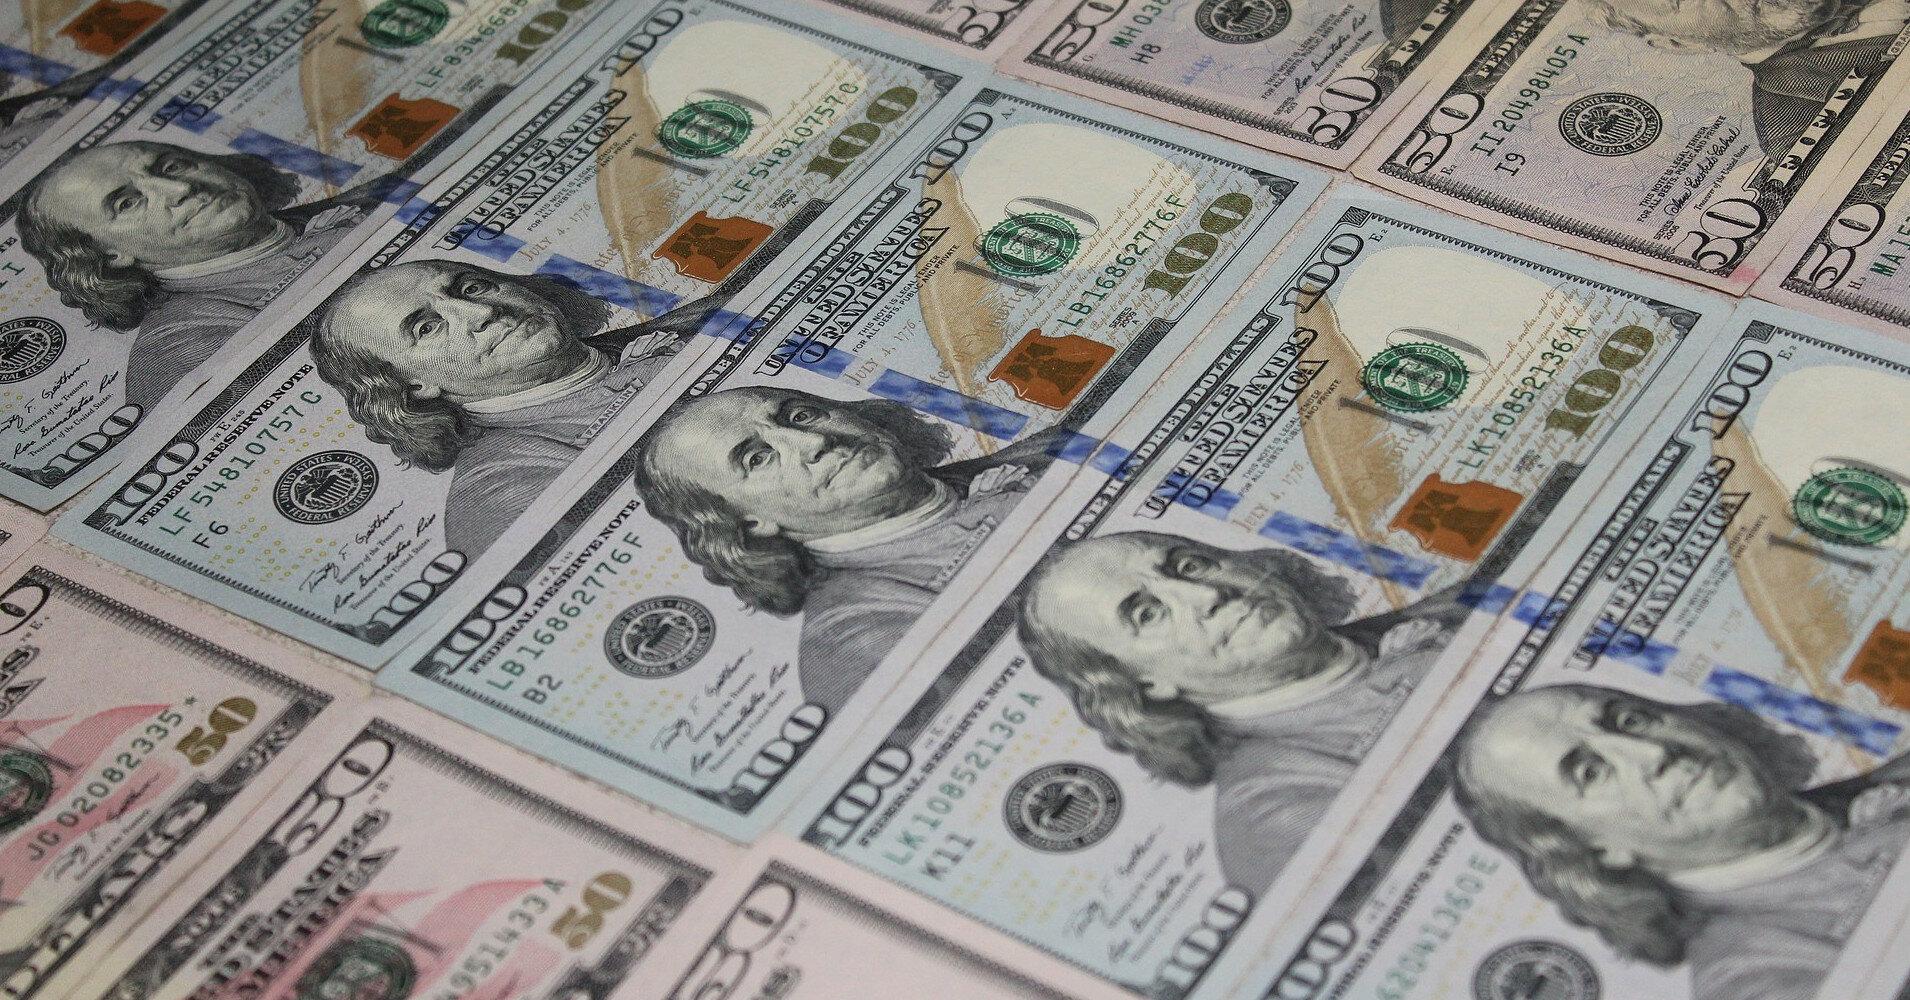 Во Флориде мужчина украл 24 млн долларов COVID-помощи